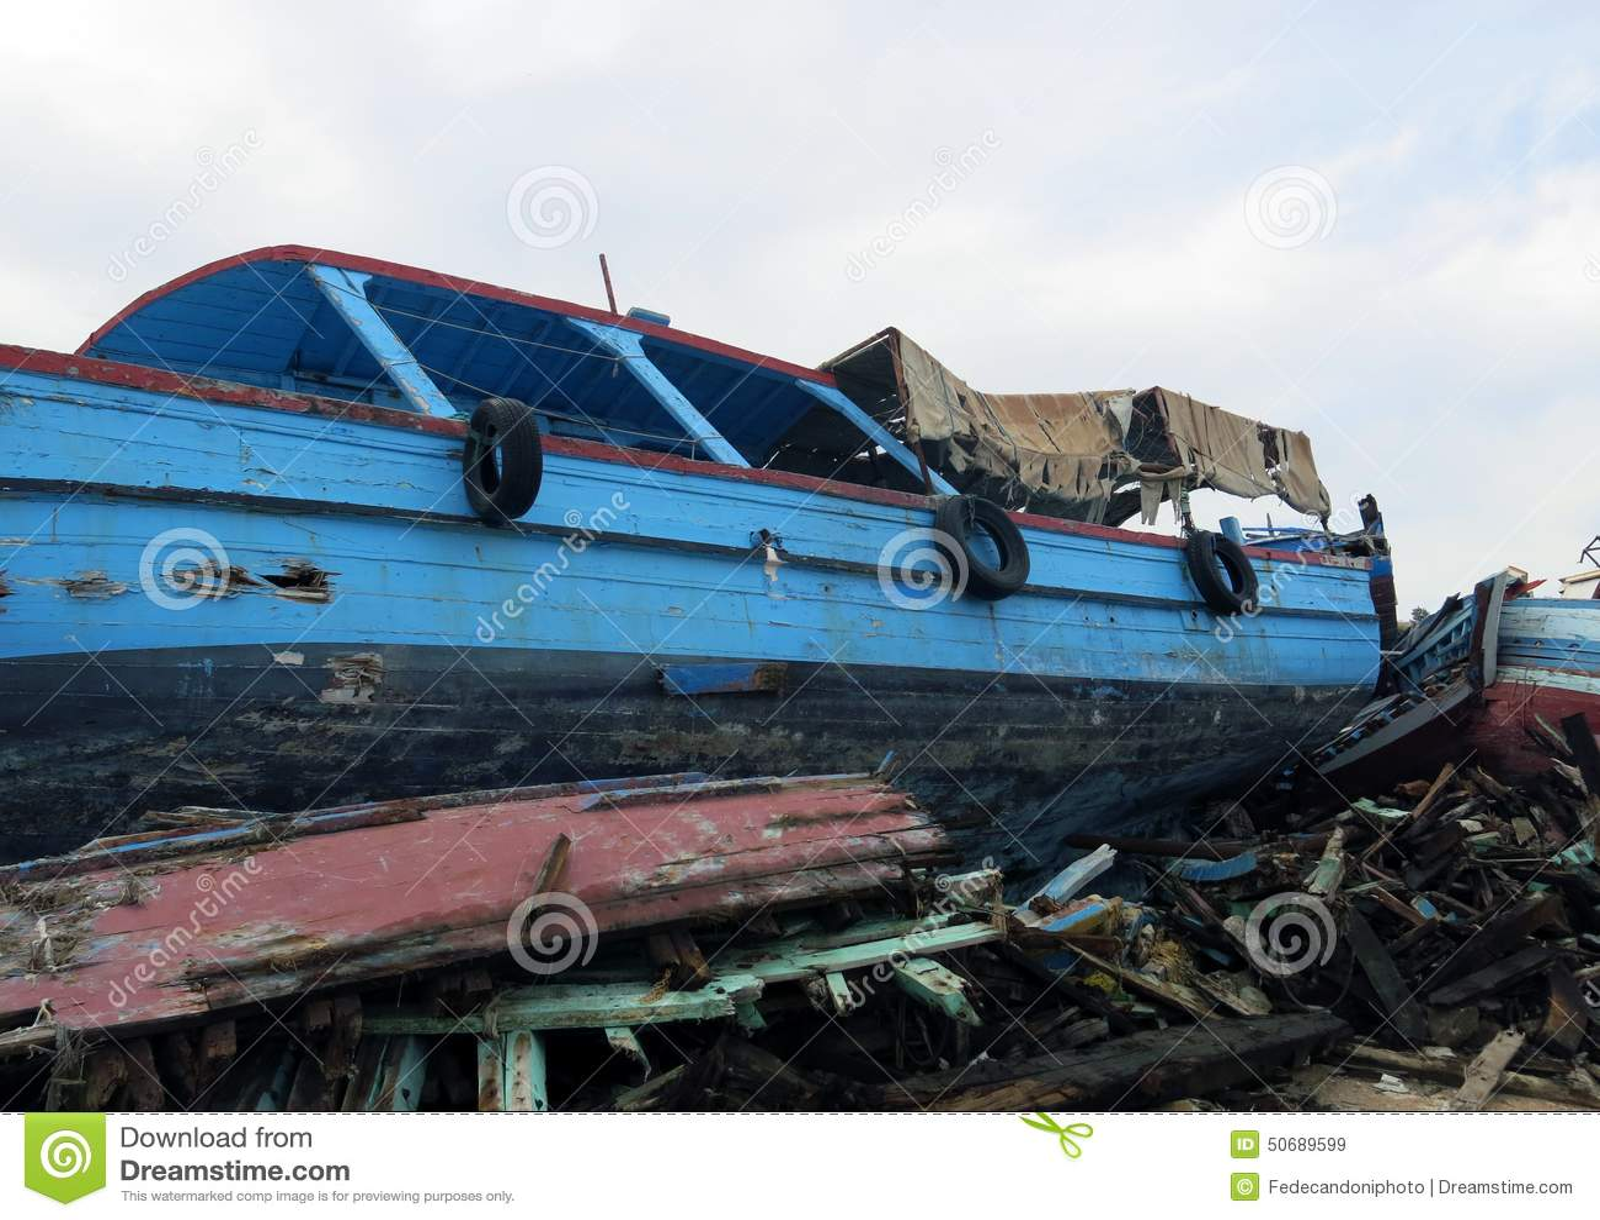 Download 在难民的登陆的以后海难 库存图片. 图片 包括有 破坏, 非法, planked, 垃圾填埋, 欧洲, 地中海 - 50689599